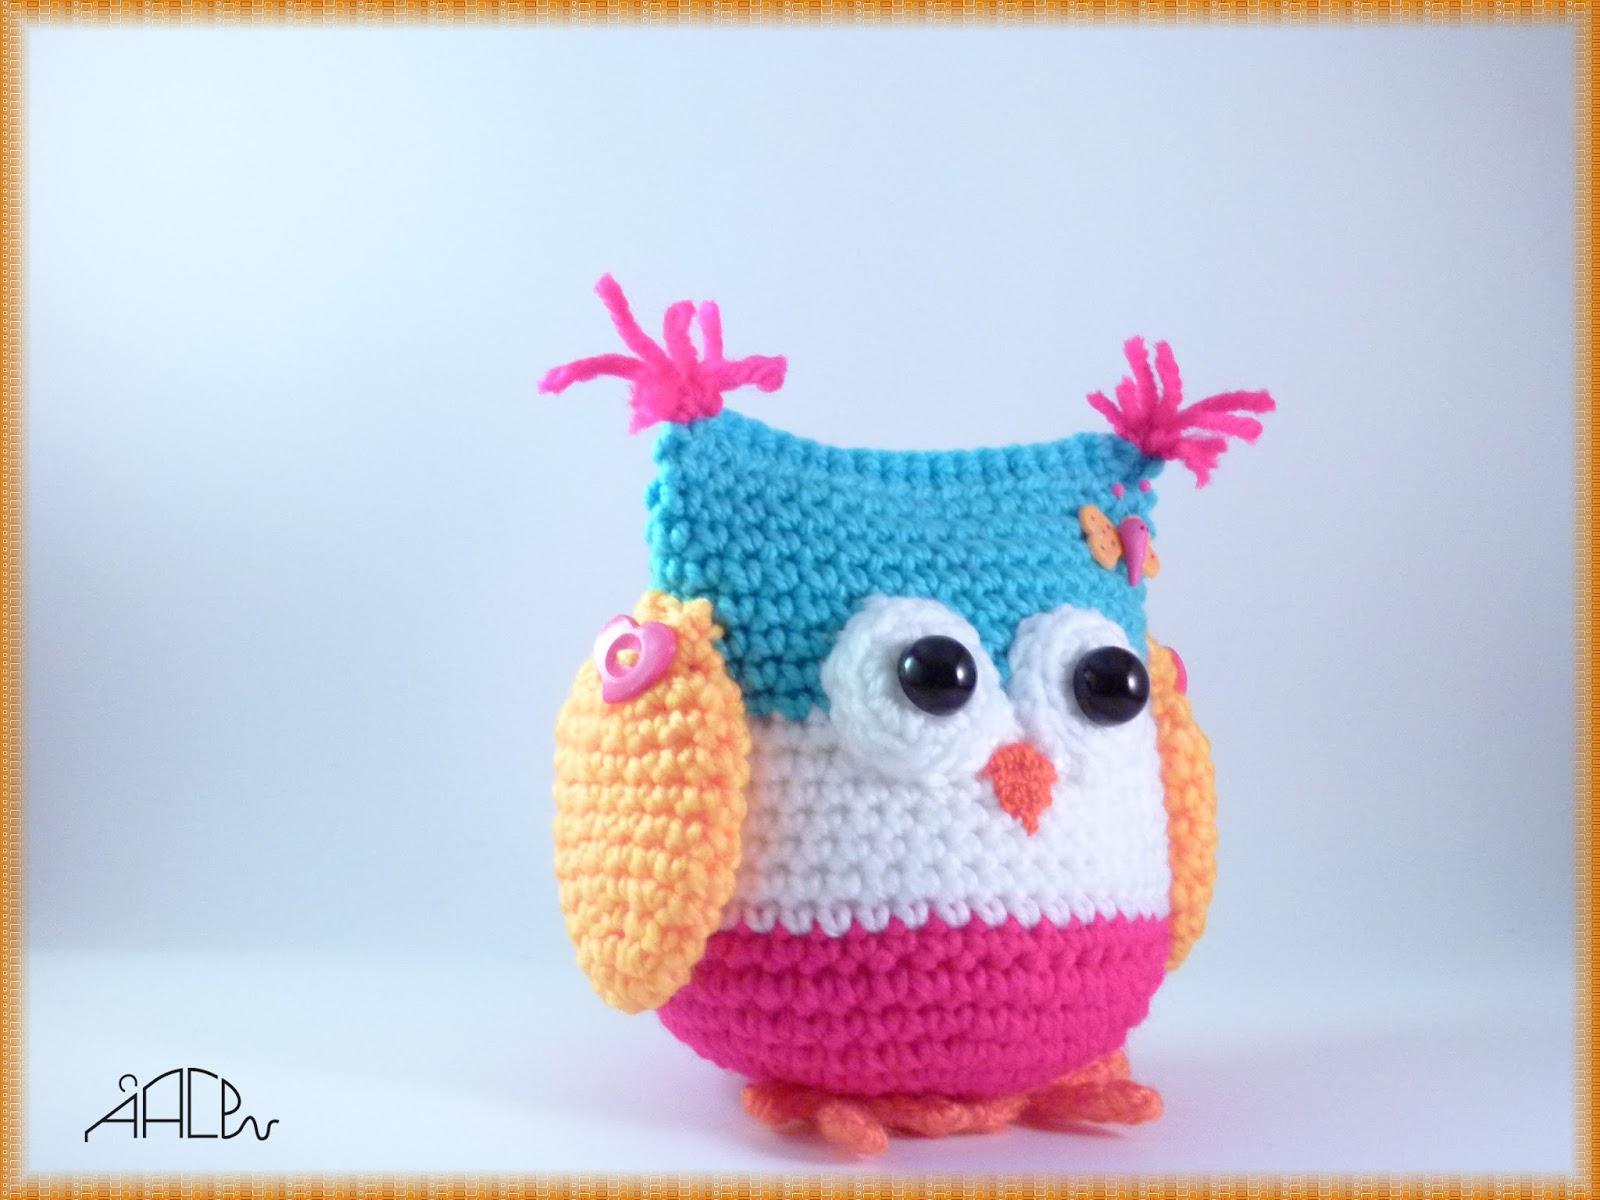 Pin de Stella Hiribarren en lechuza | Crochet amigurumi patrones ... | 1200x1600